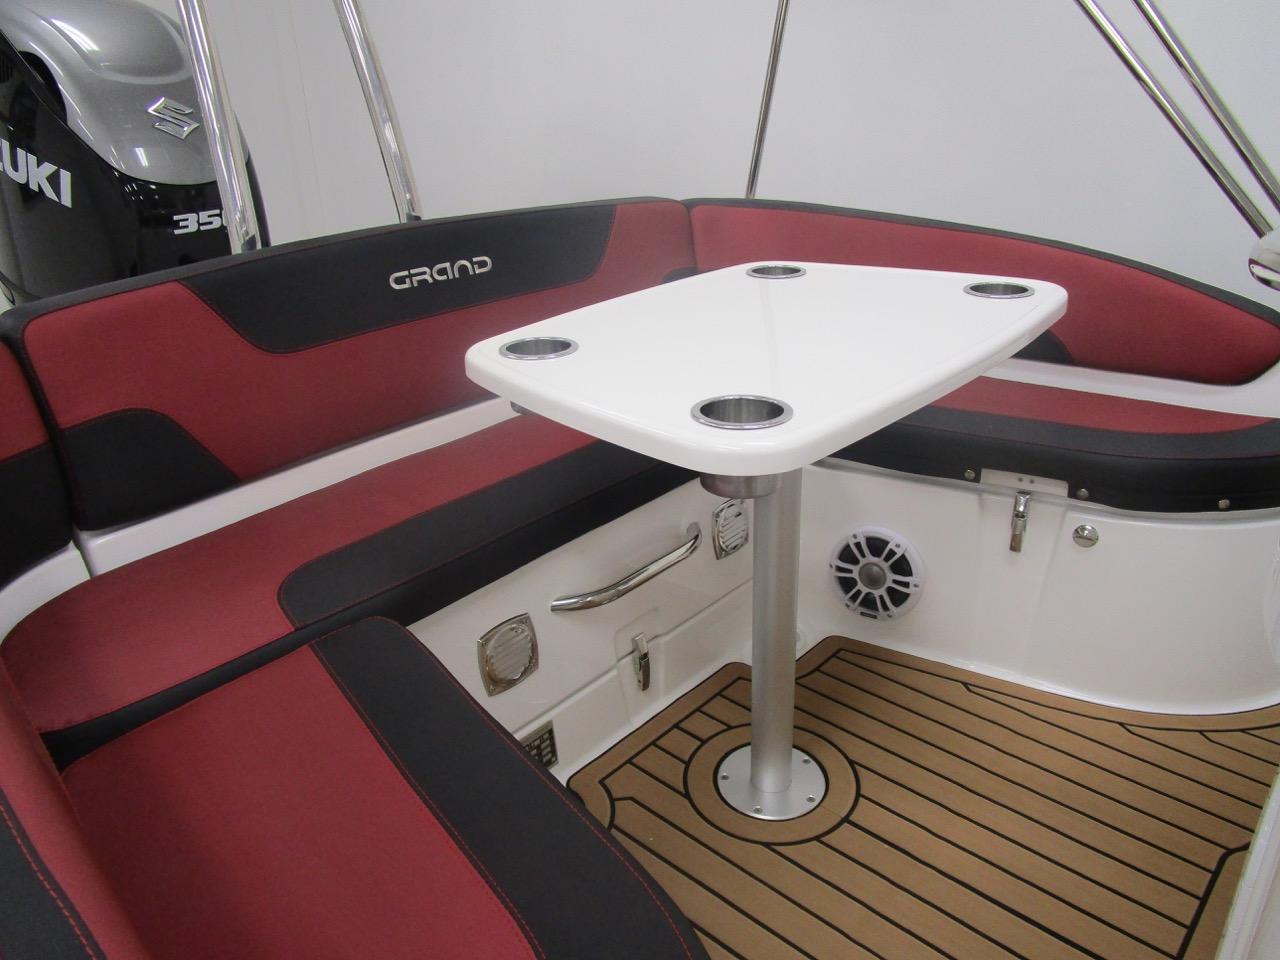 GRAND G850 RIB rear seat, table and leg room